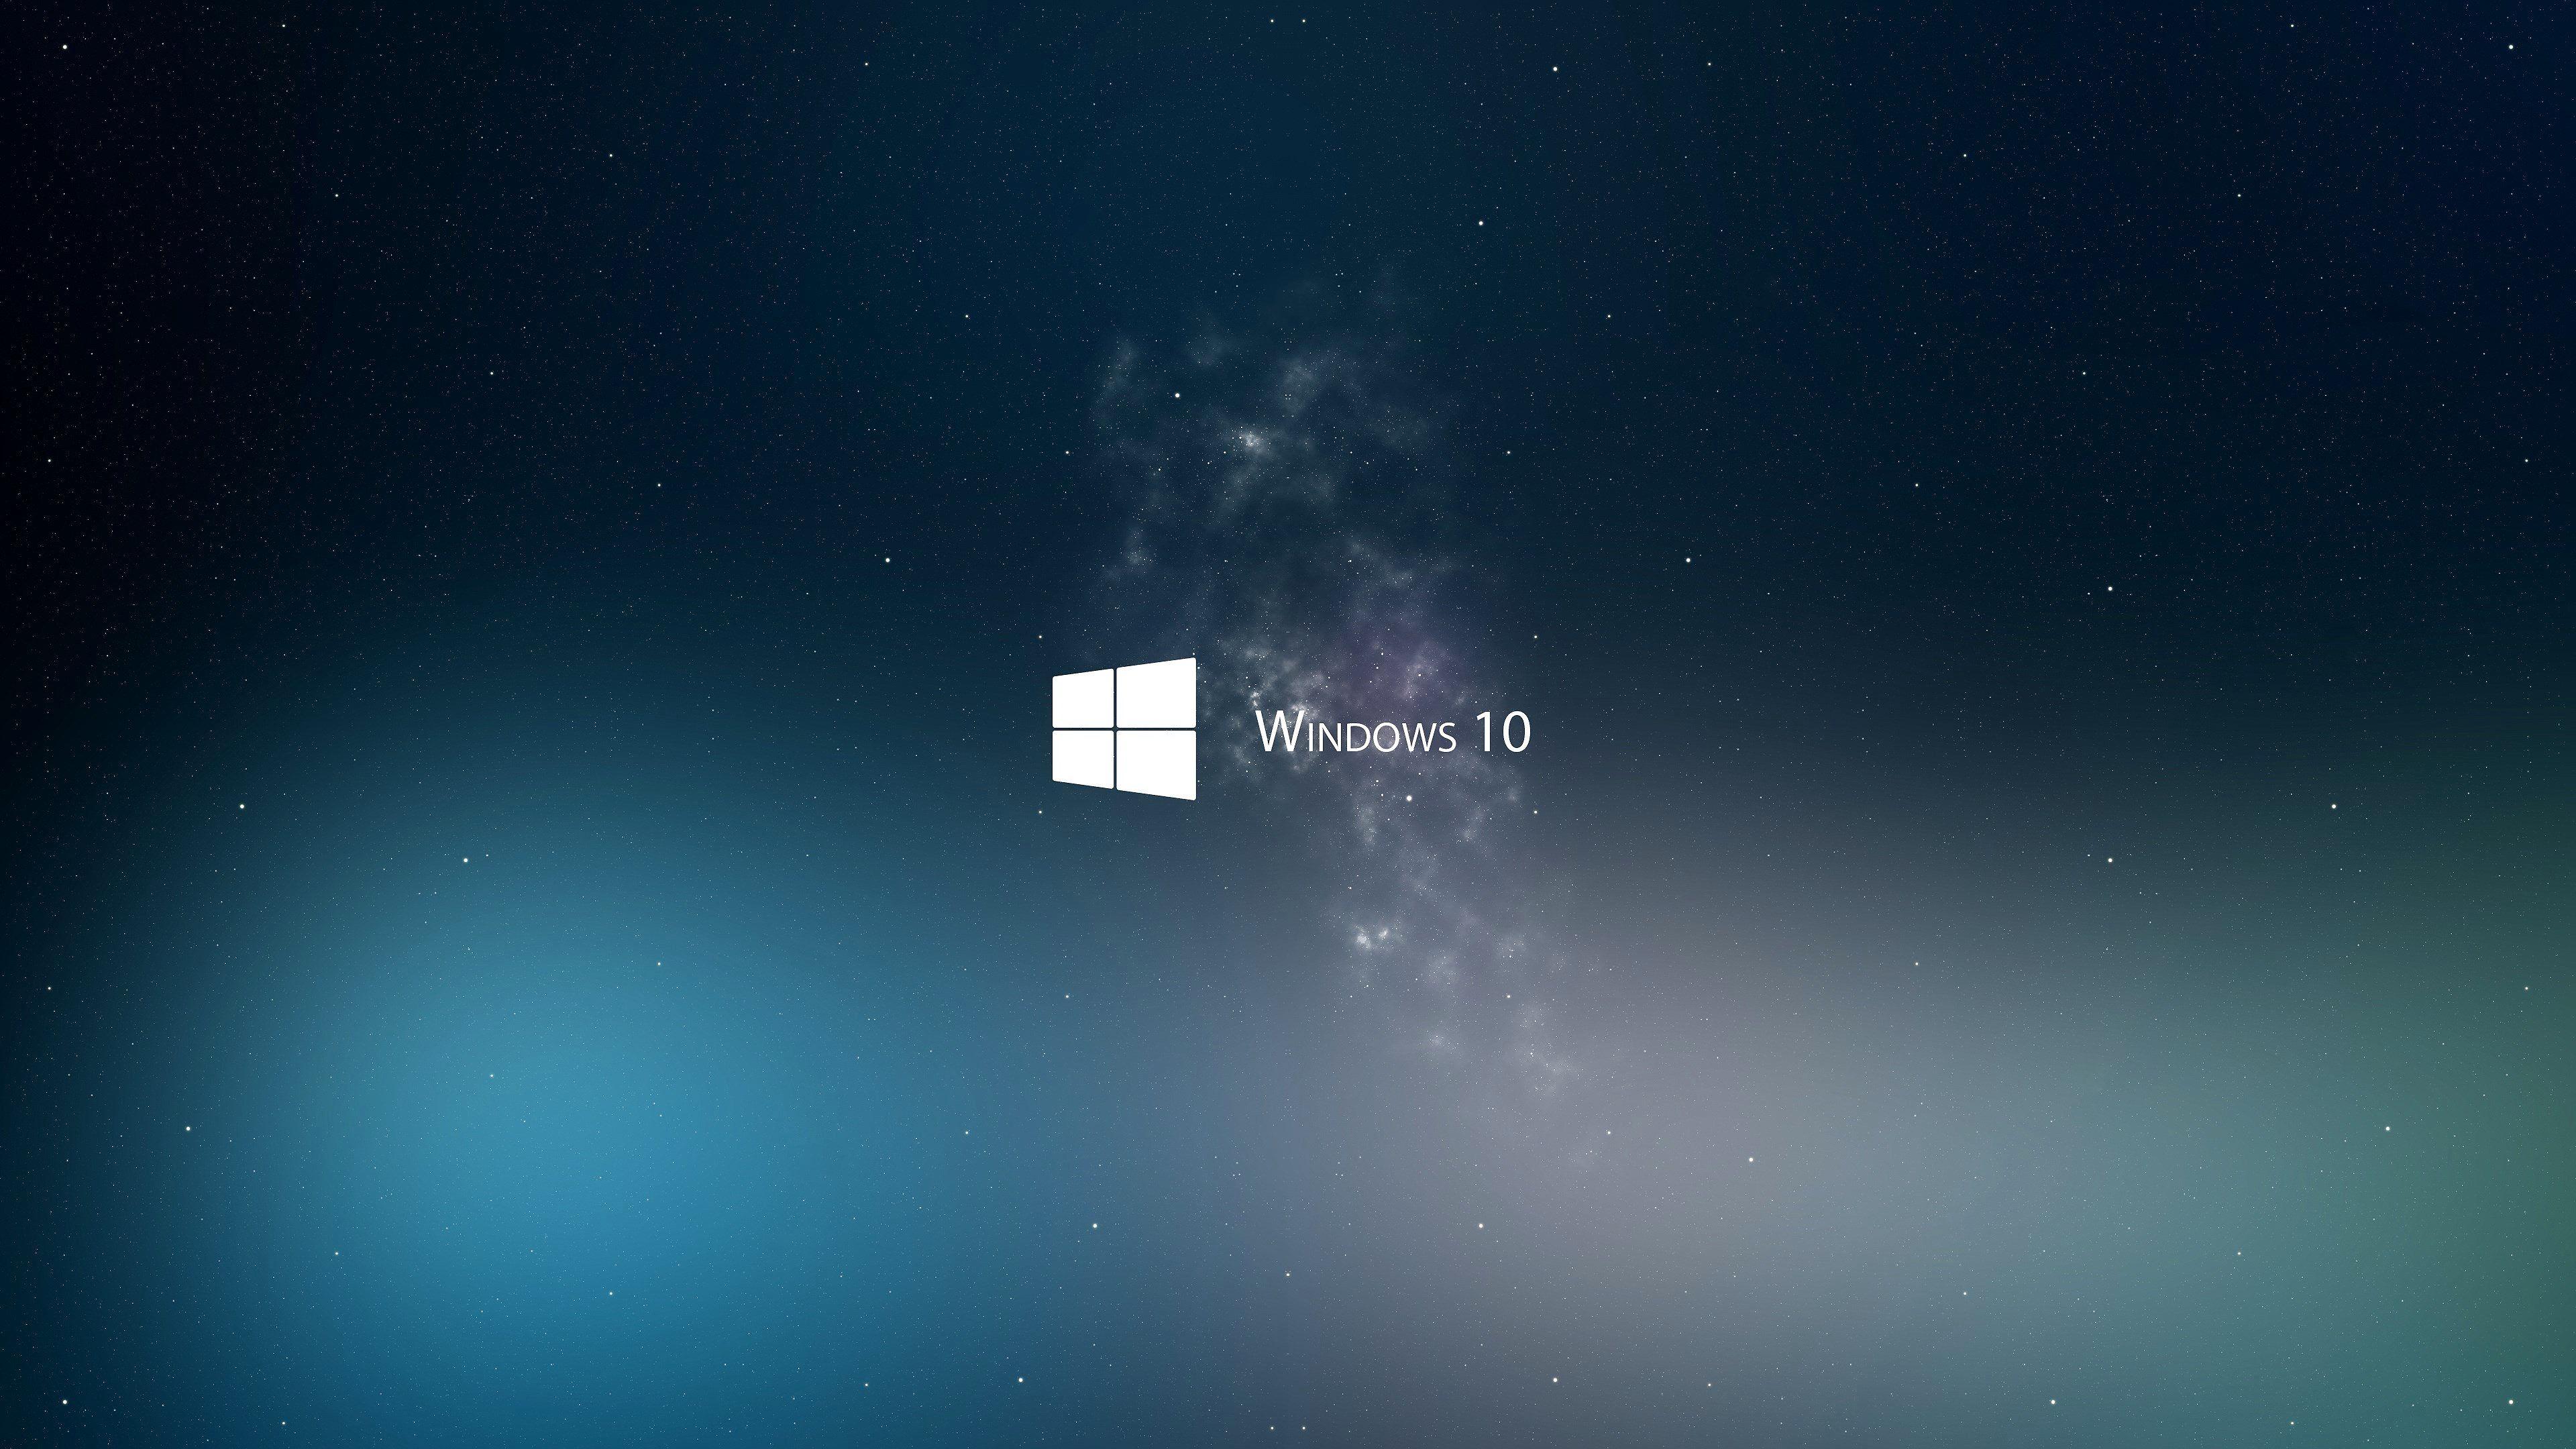 4k Wallpaper Windows 10